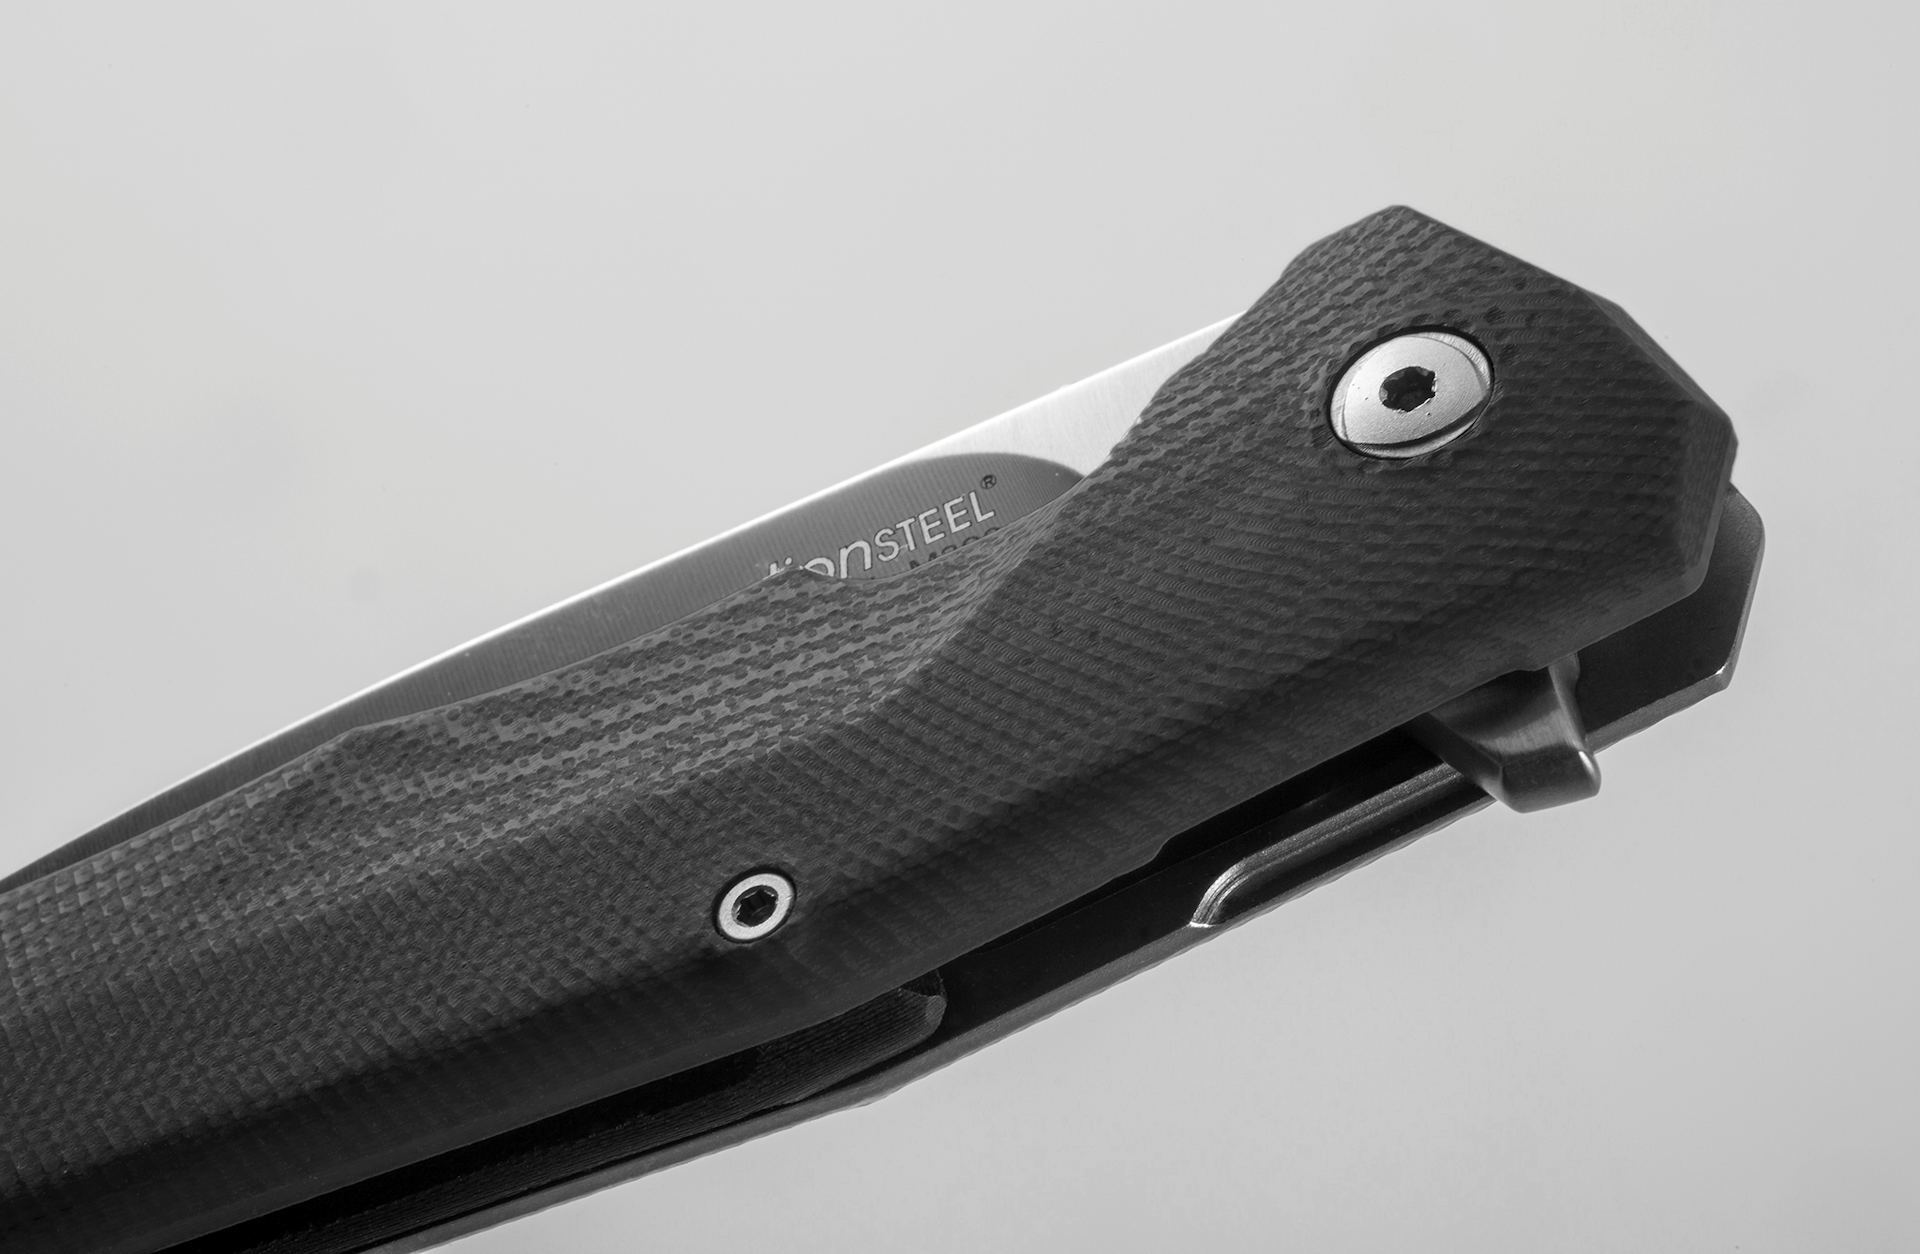 Фото 7 - Нож складной LionSteel T.R.E. G10 Black, сталь M390, рукоять G10/титан от Lion Steel